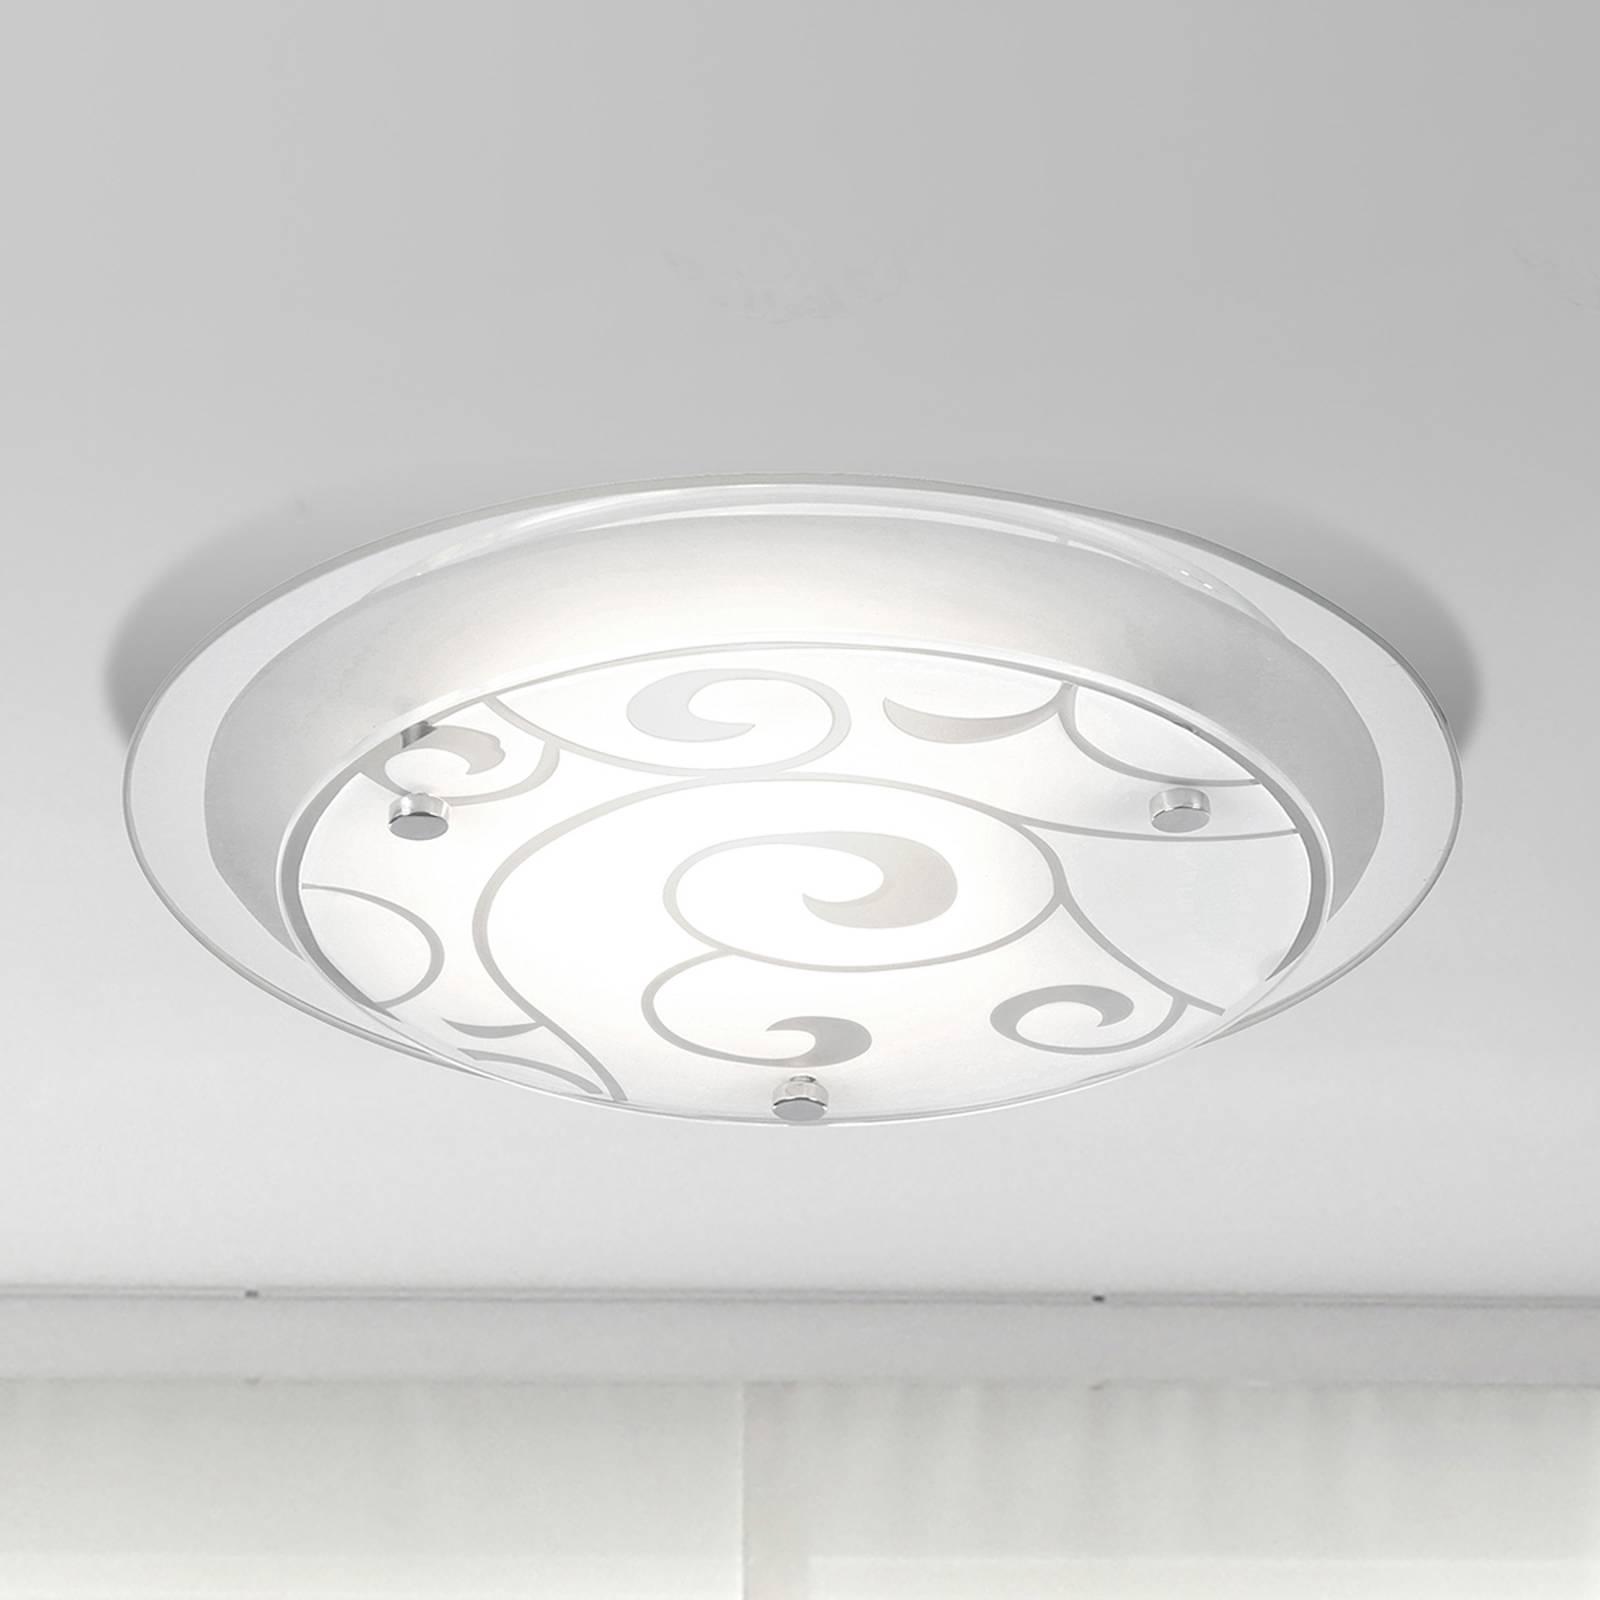 Elegante plafondlamp KRISTJANA, 25 cm